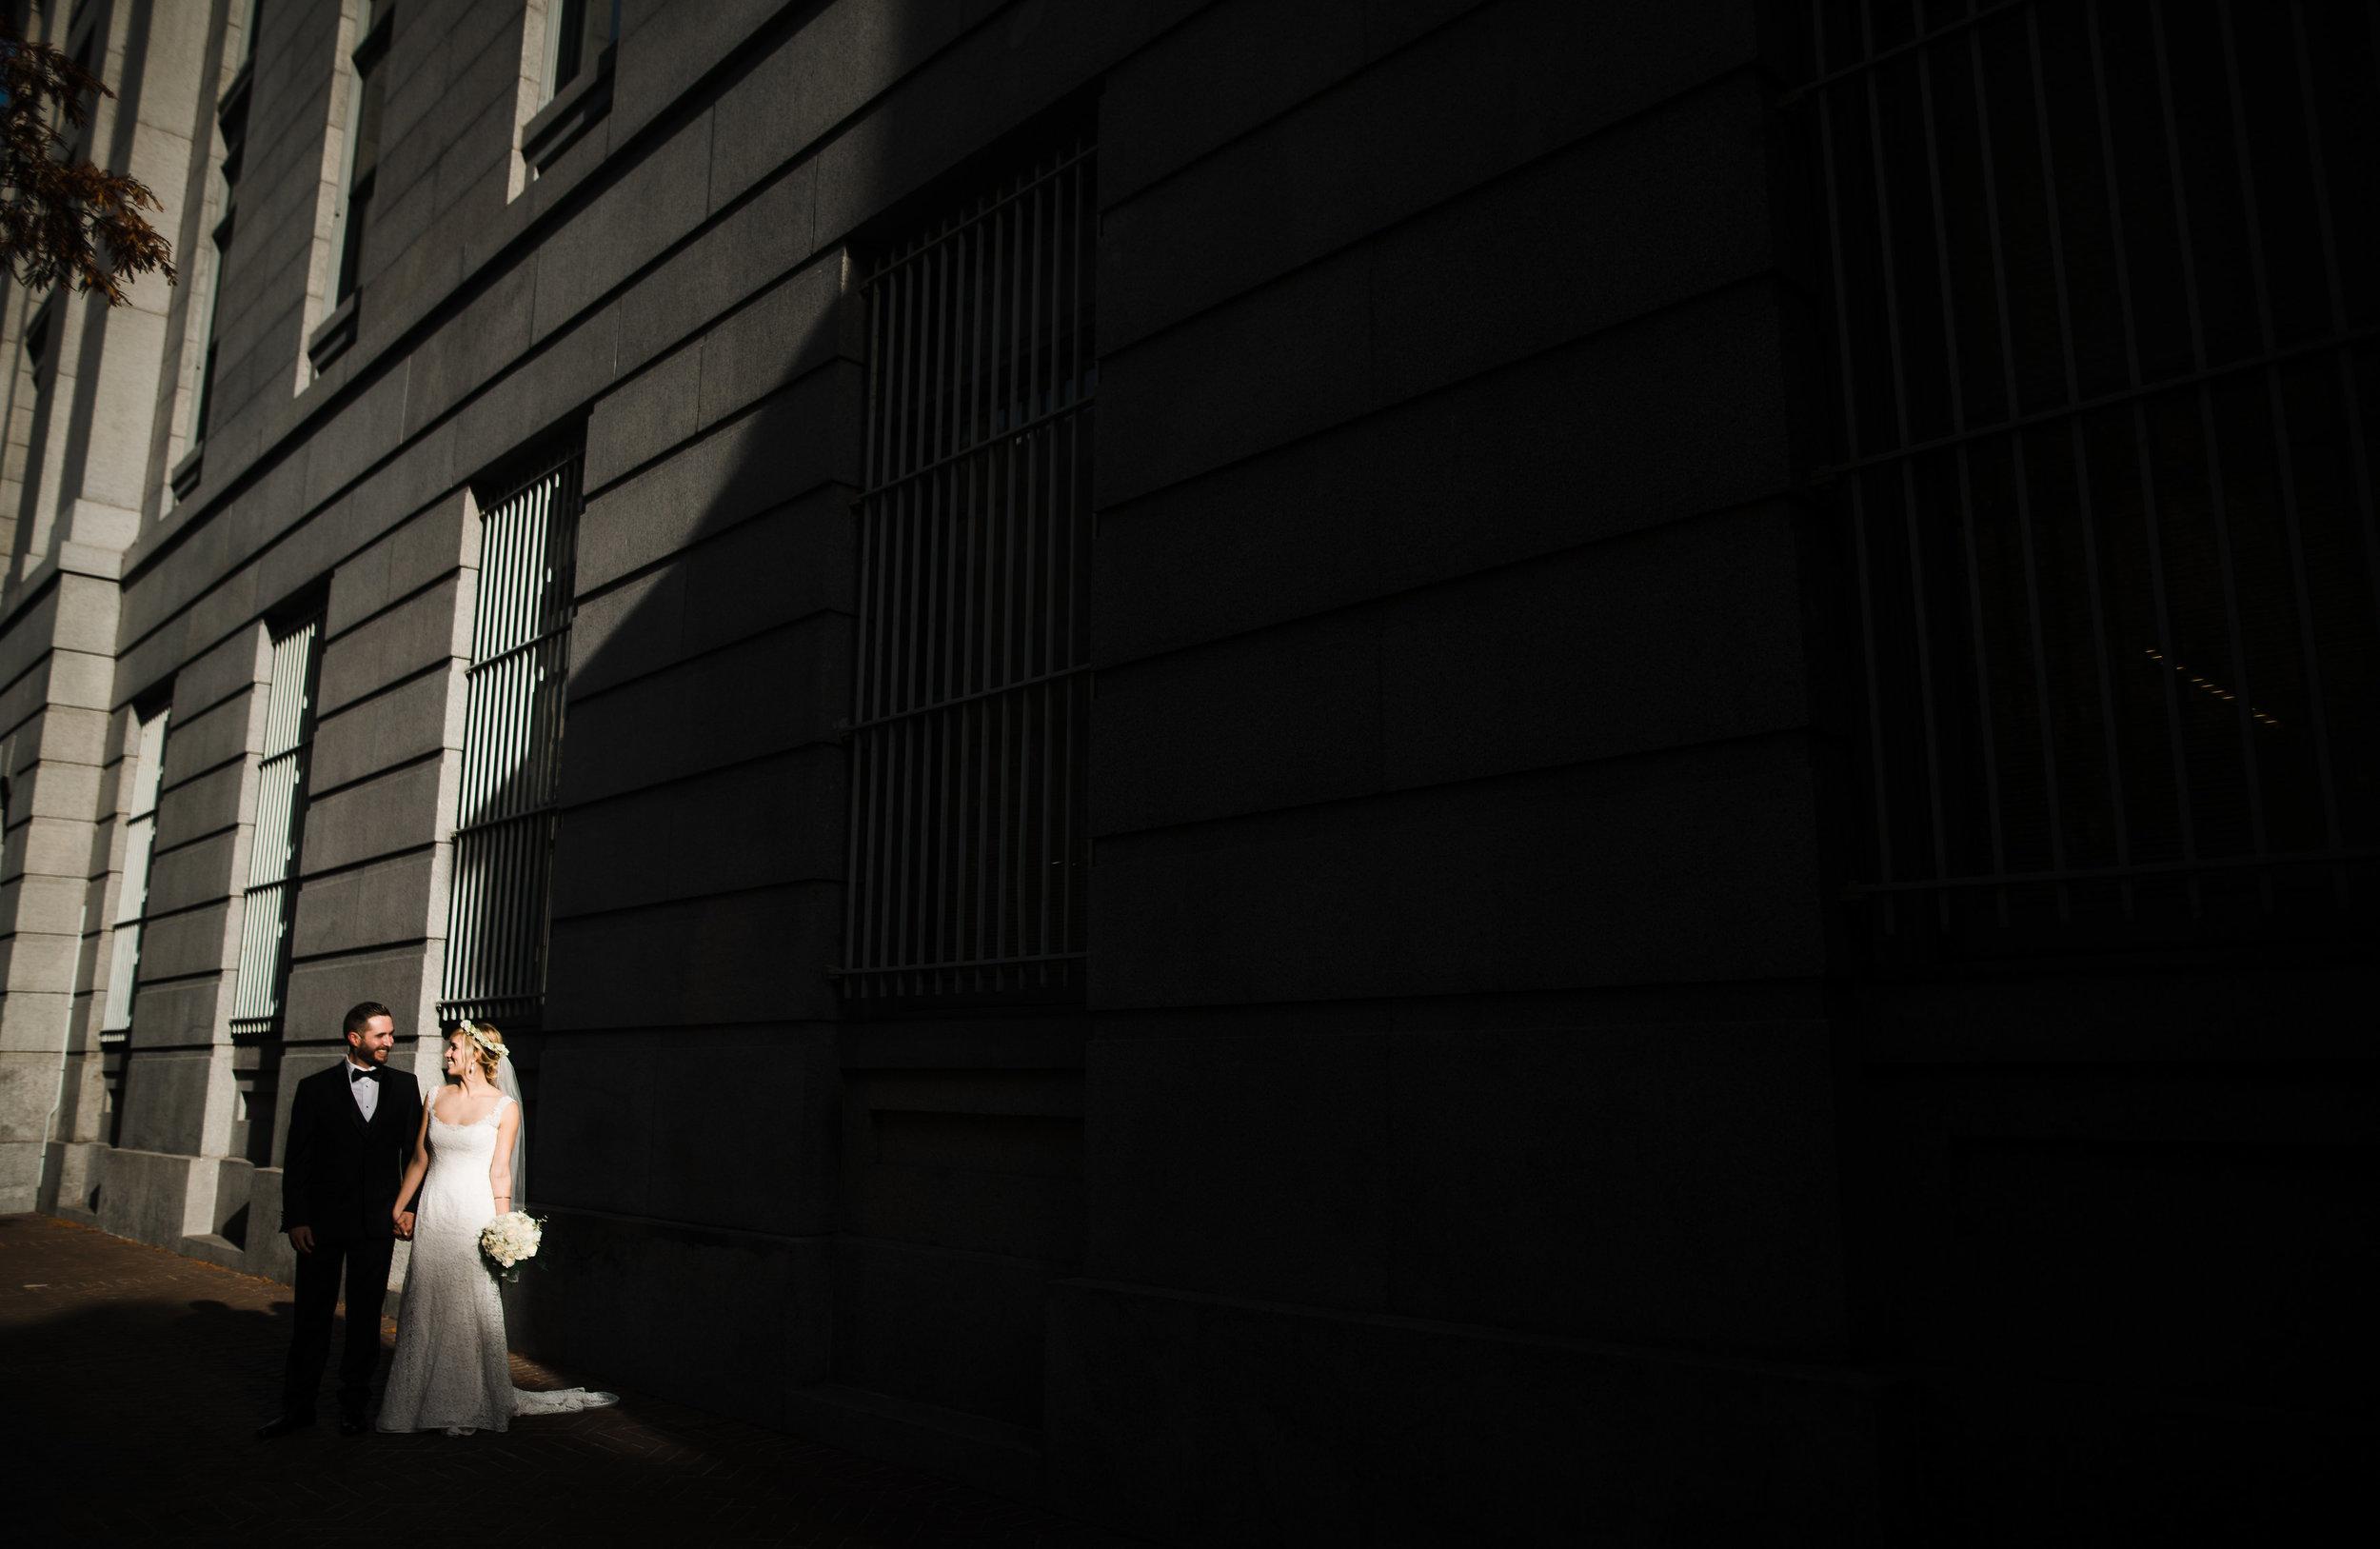 Isaiah&TaylorPhotography-Jonathan&Meagan,NewOrleansWedding-153.jpg